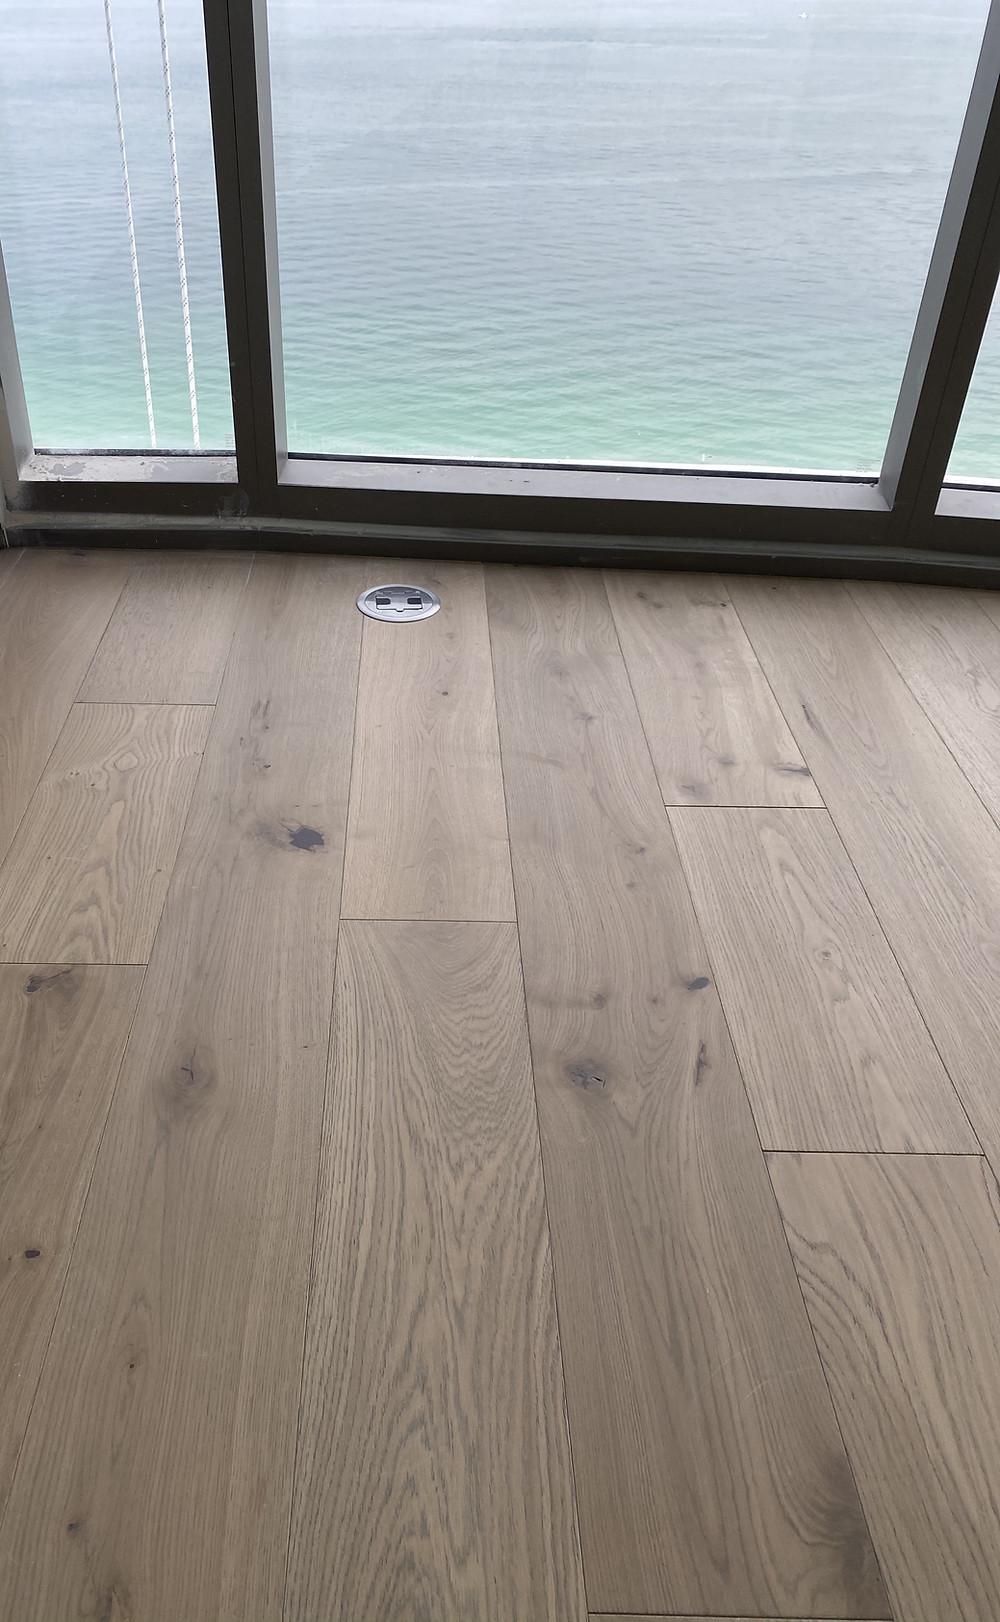 Hardwood flooring best for Miami